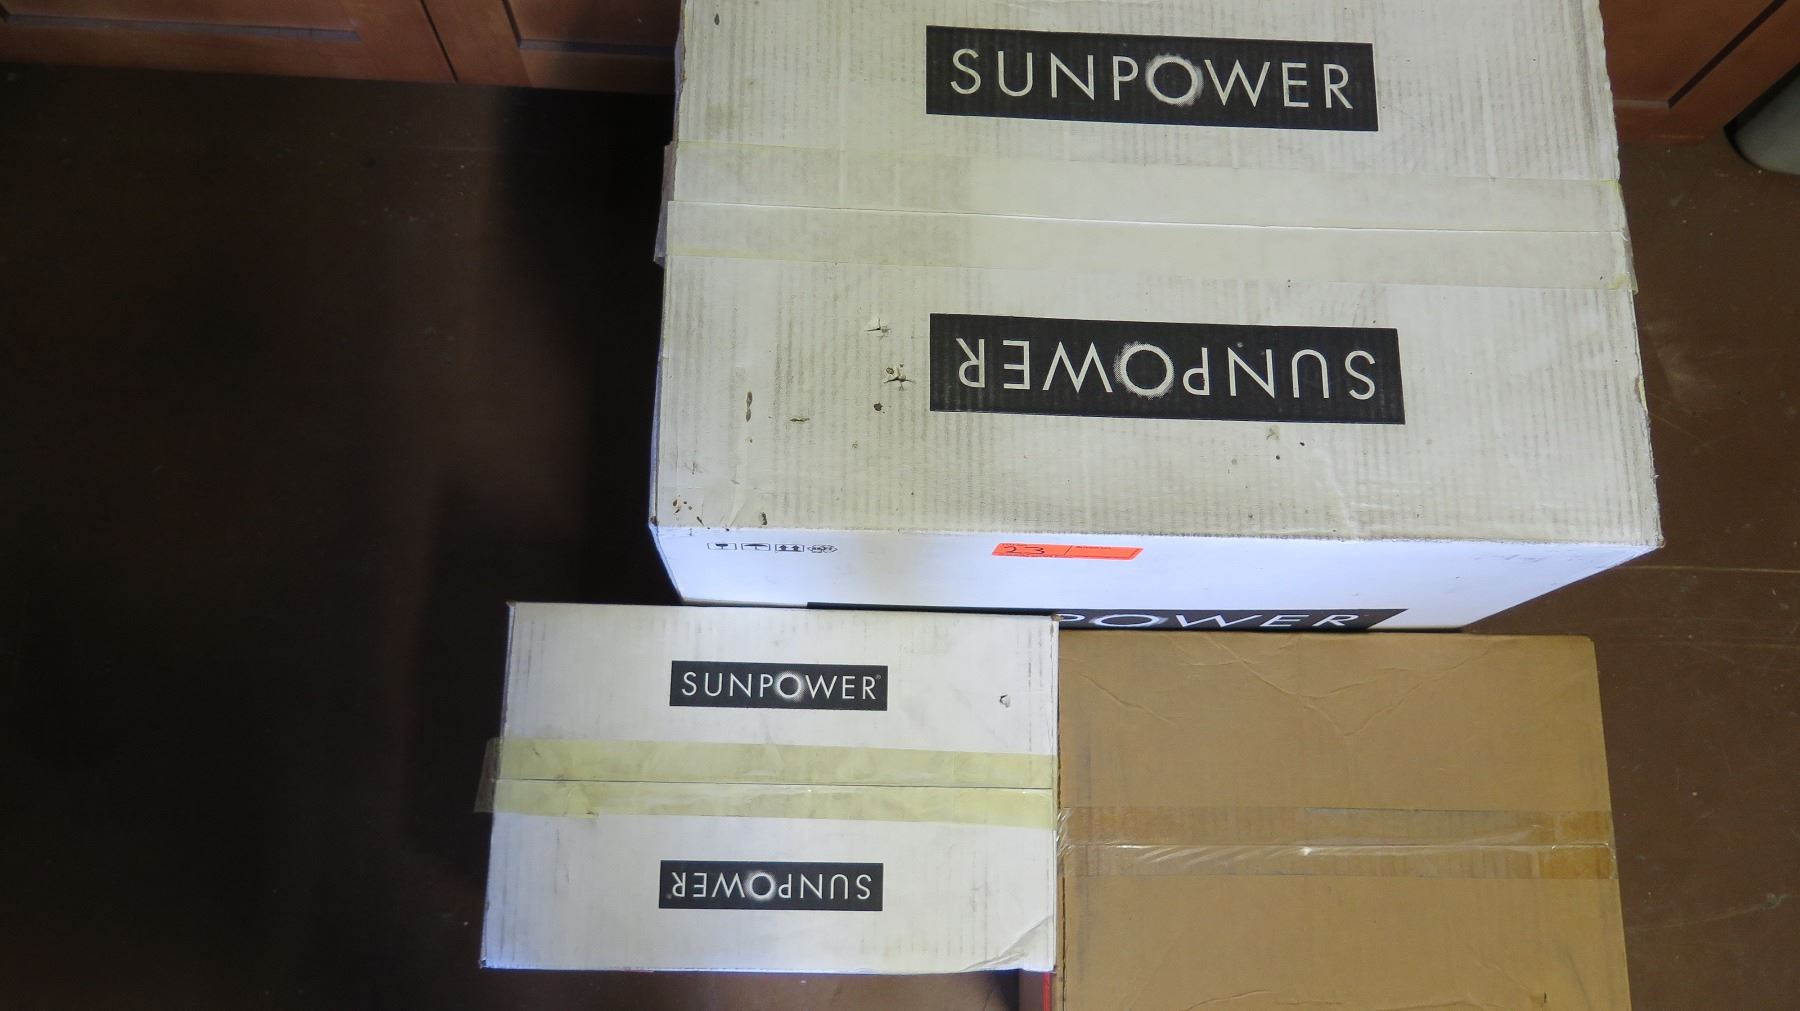 New Sunpower SPR 4000M Inverter, Sunpower SPR-DC-DISC22-M-US